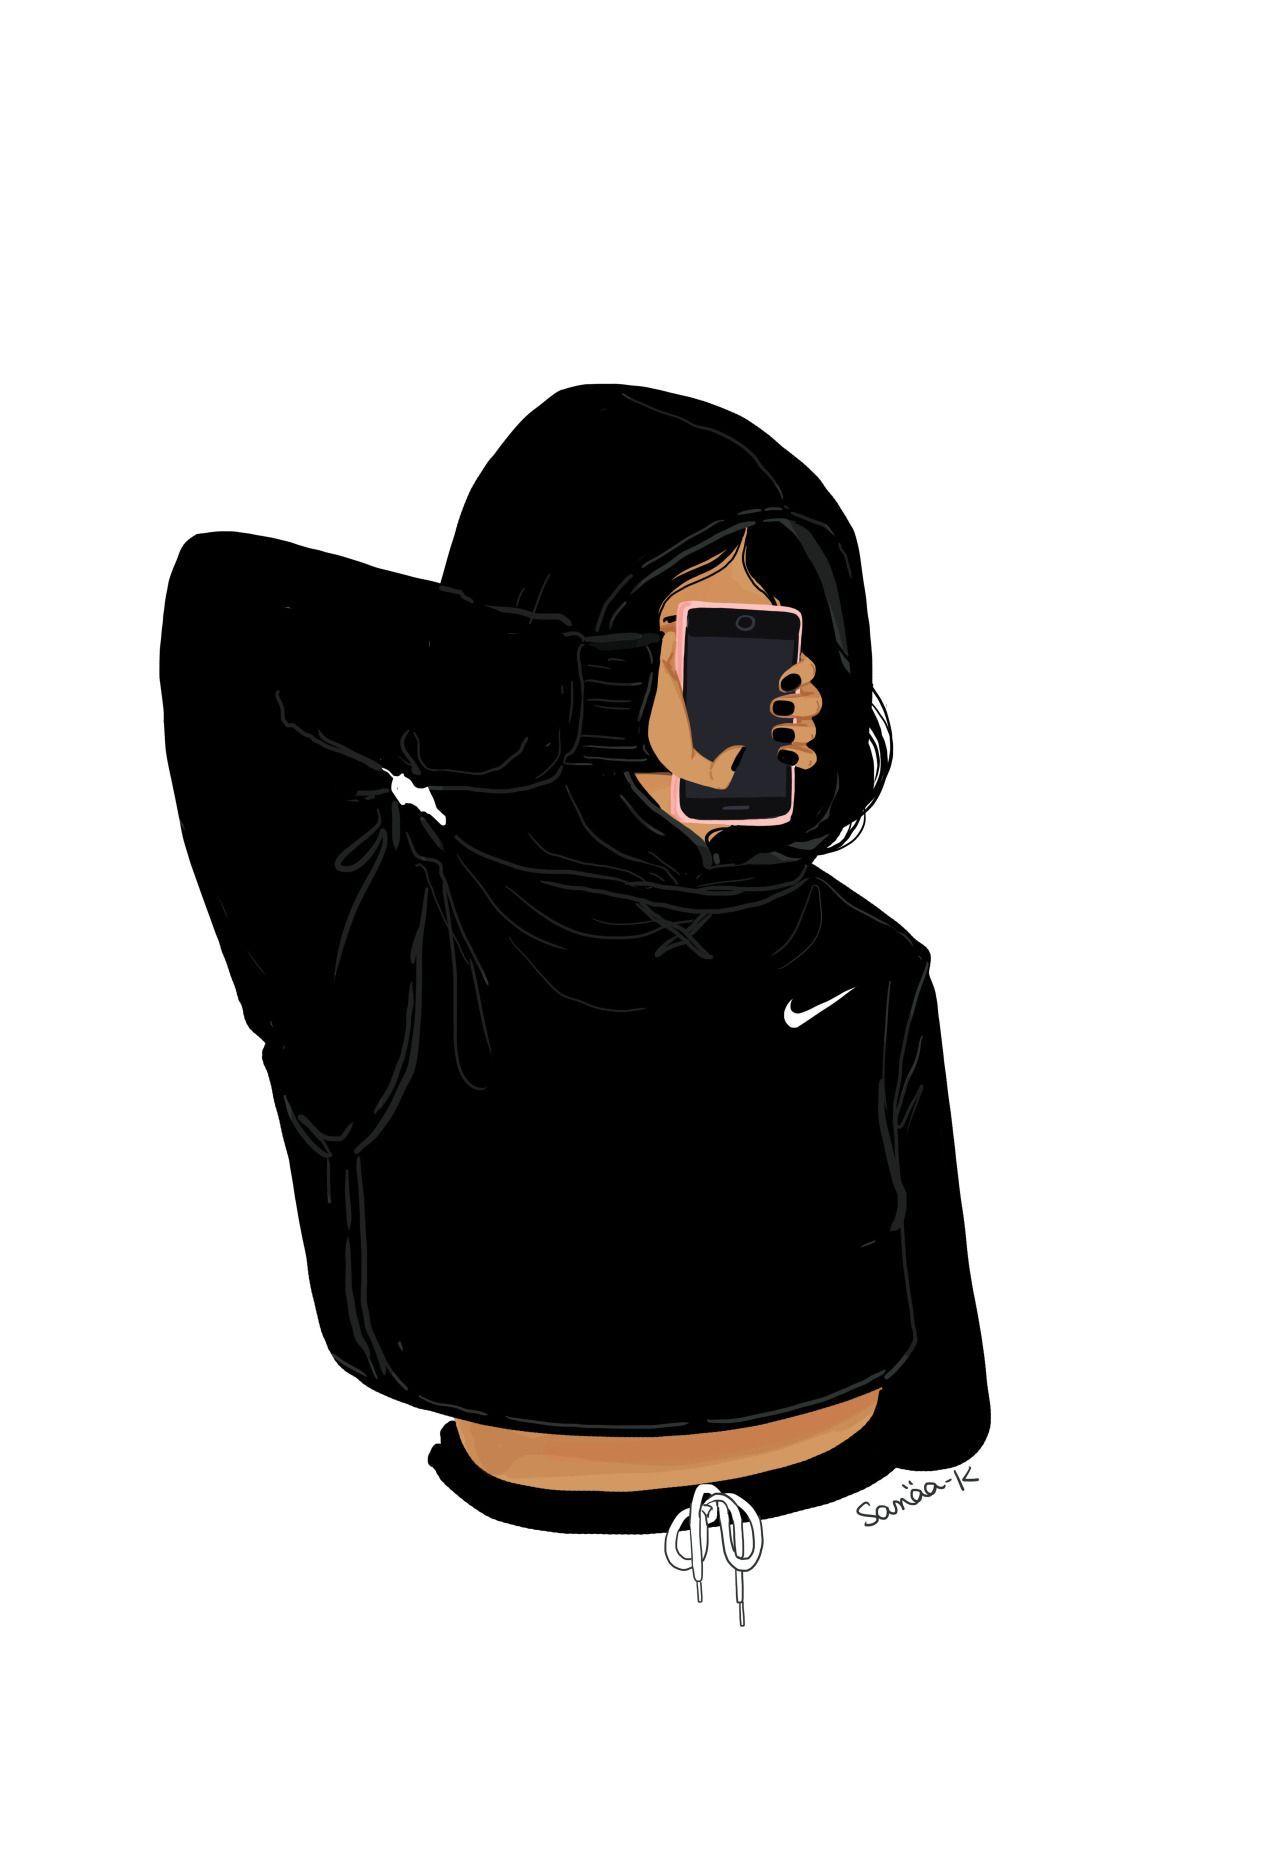 Nike Girl Cartoon Wallpaper